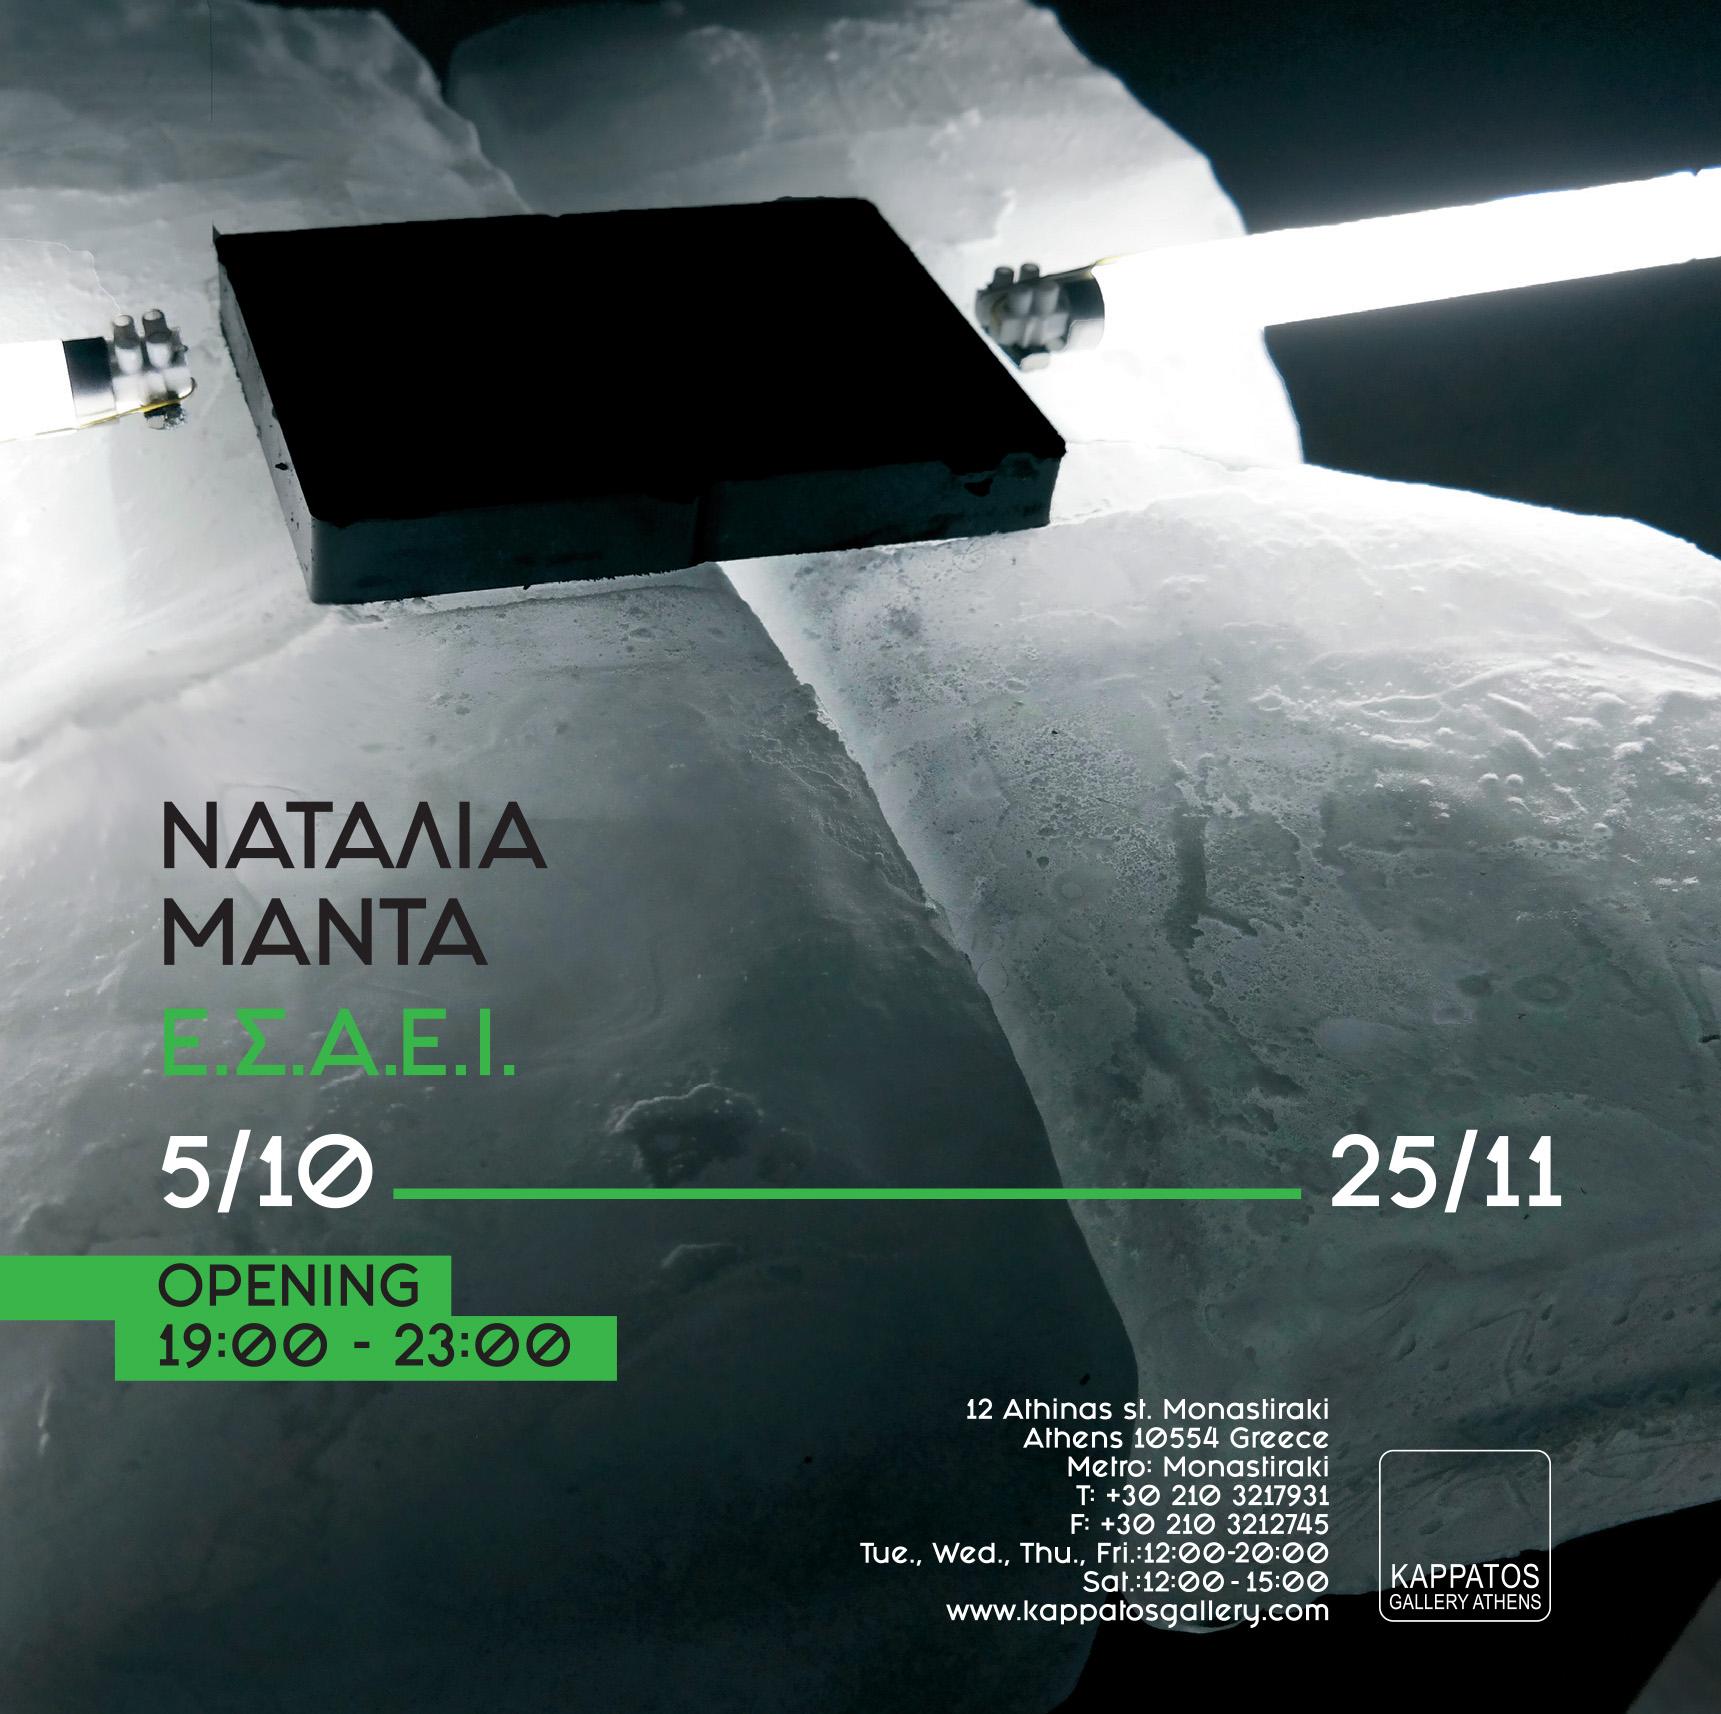 NATALIA-MANTA-KAPPATOS-invitation